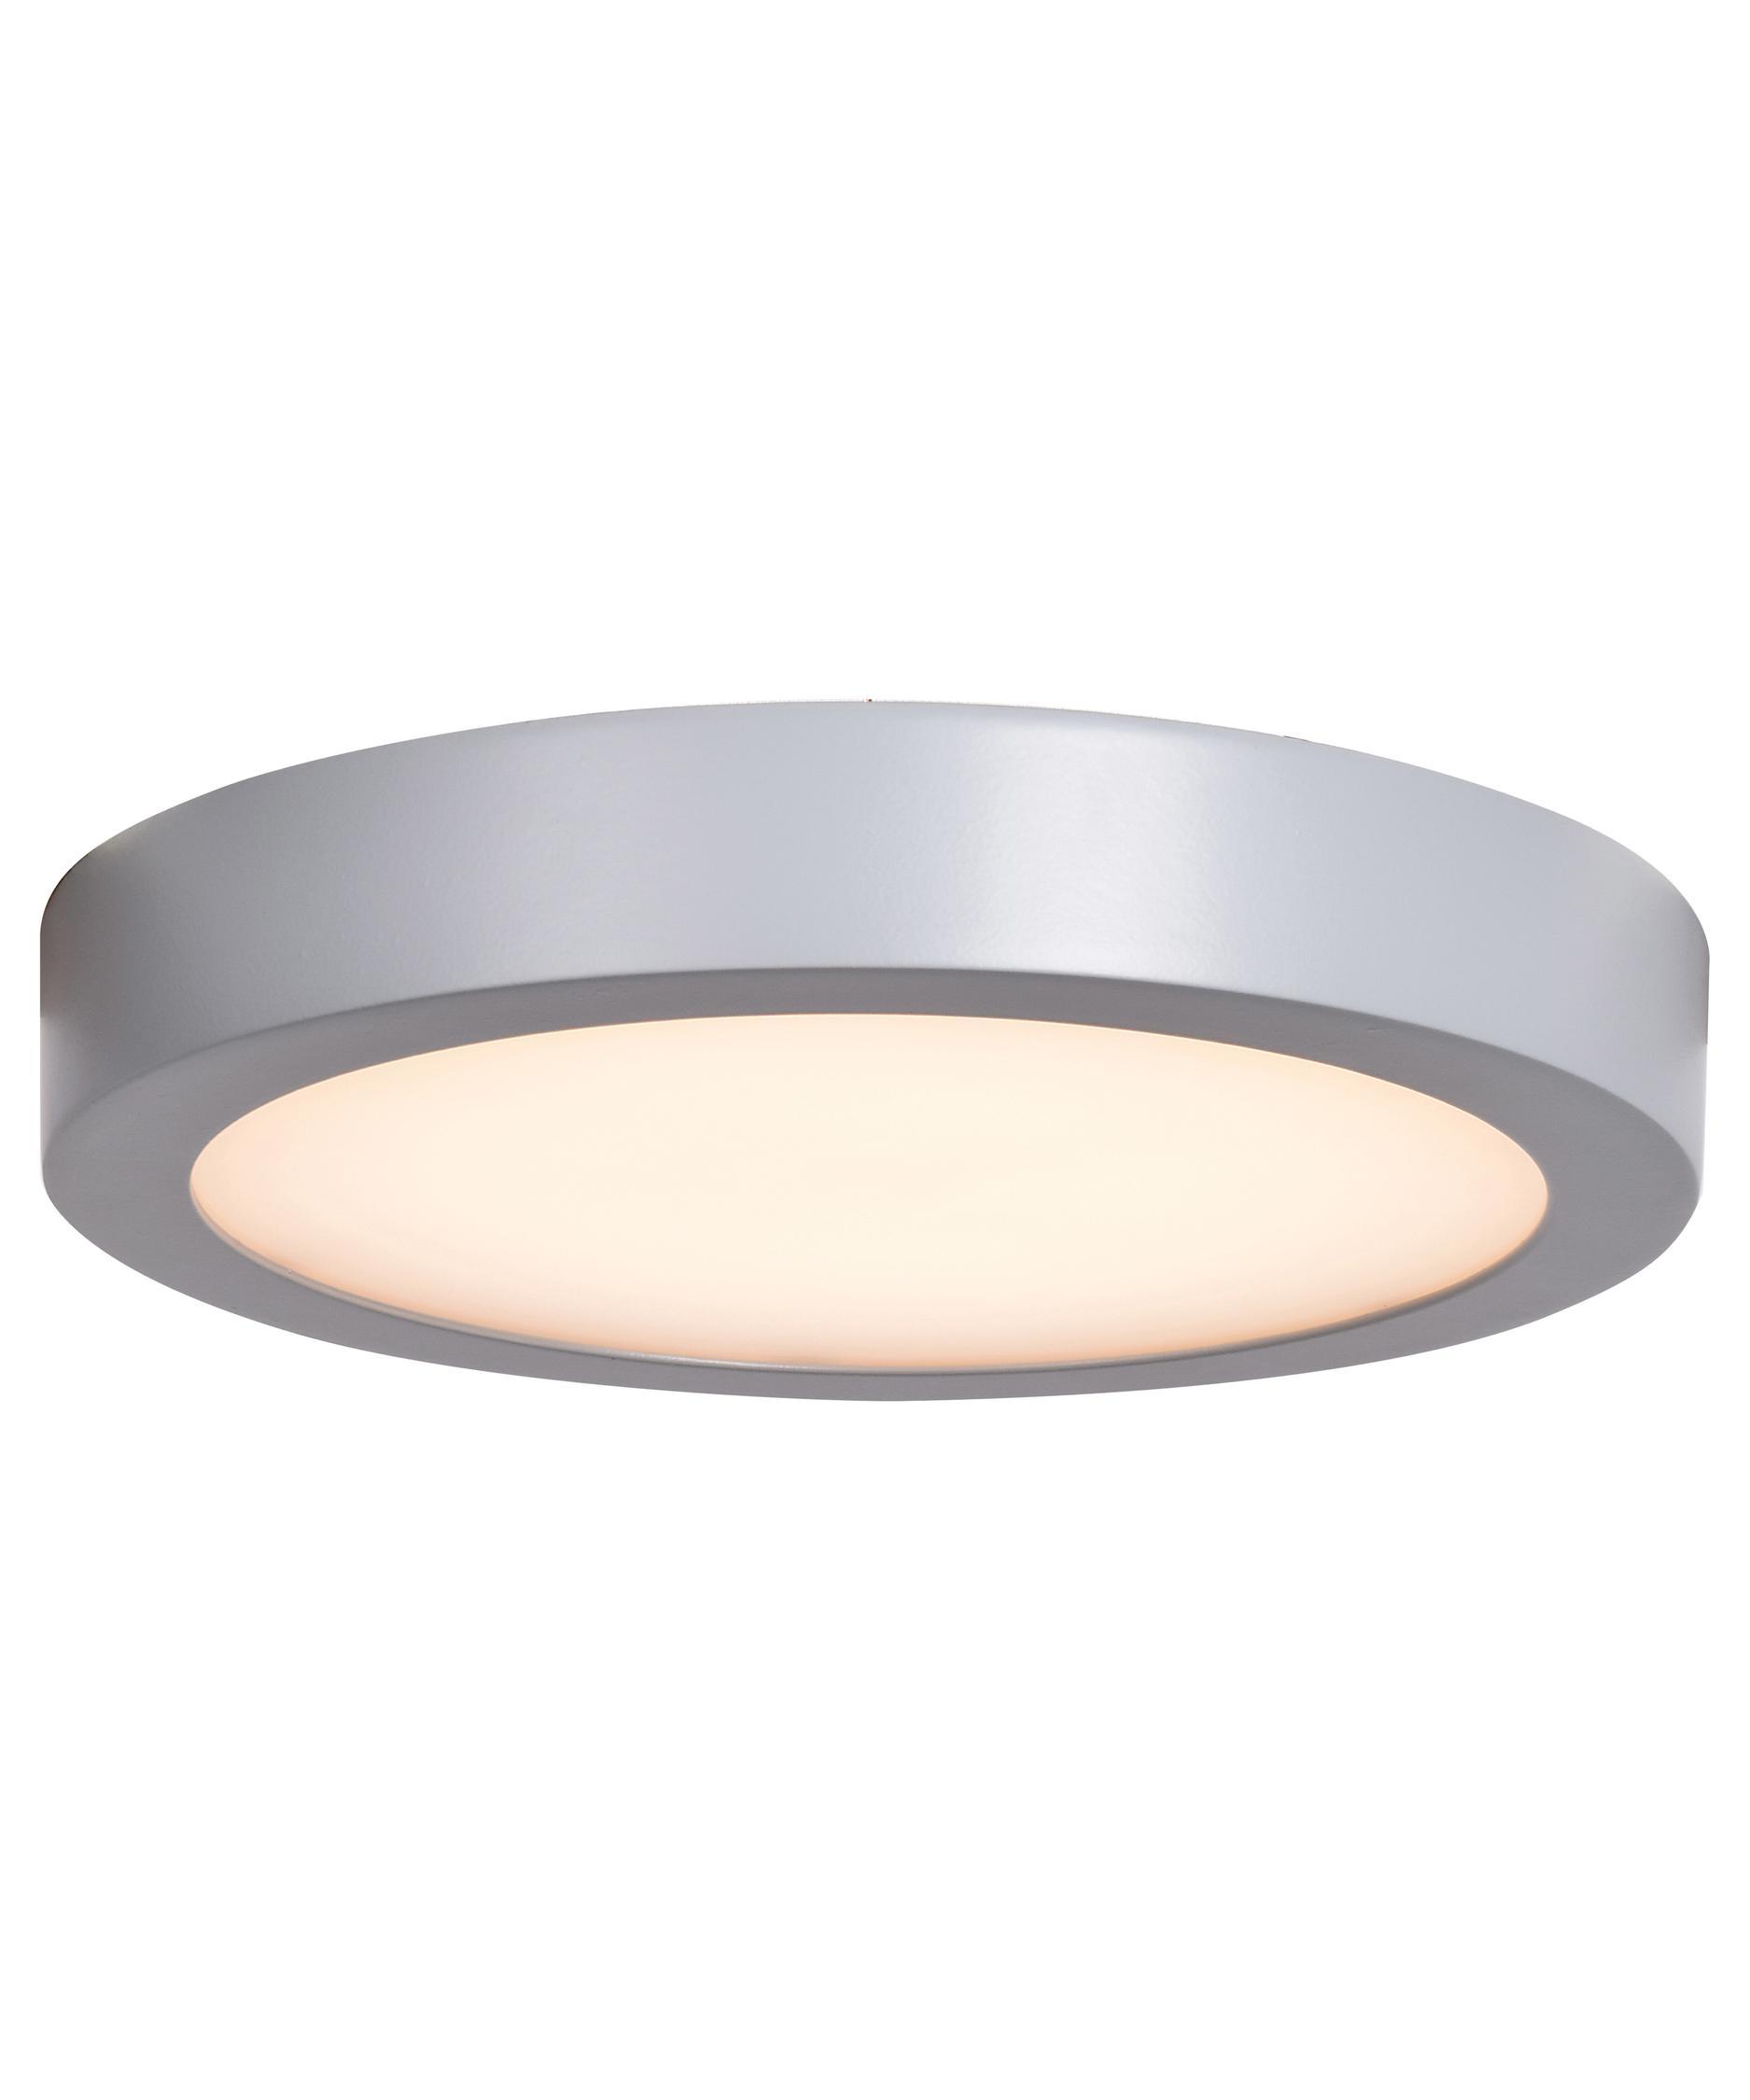 Access lighting 20072LEDD-BRZ-ACR 1 x 9 in. Ulko Exterior LED Wet Location Flush Mount Bronze & Acrylic Lens